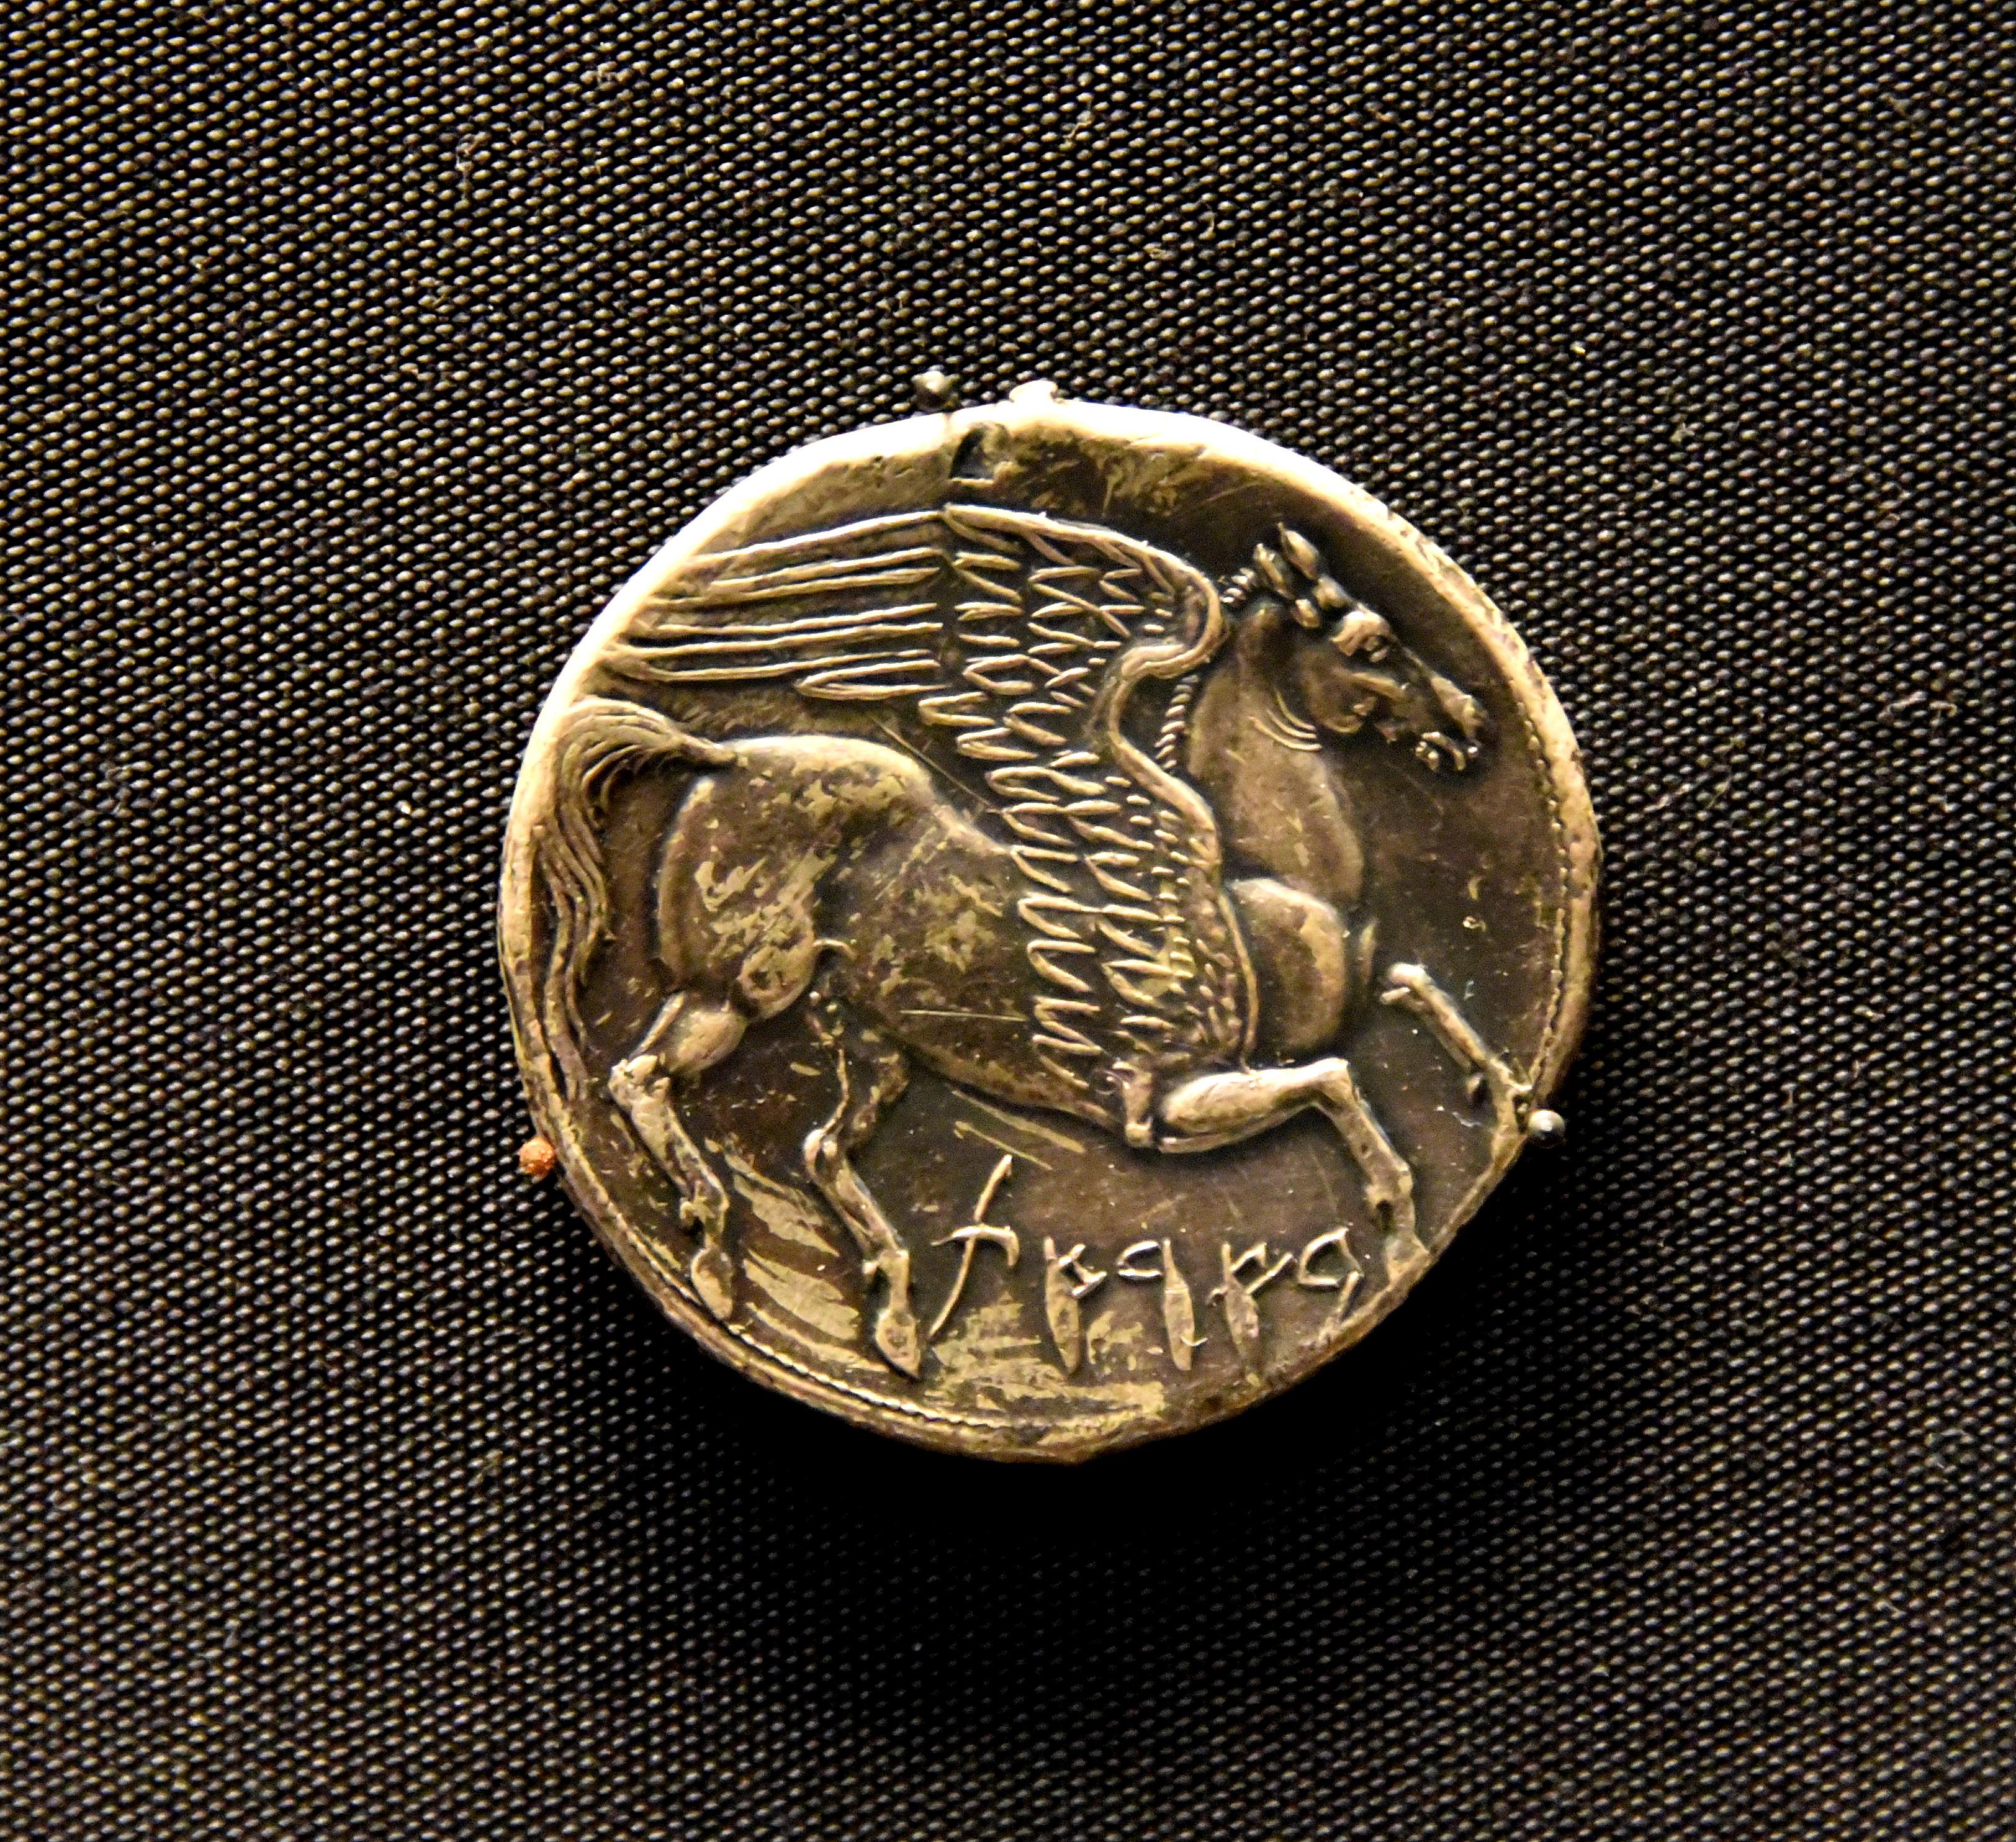 Carthage Campaign Inscription on Coin